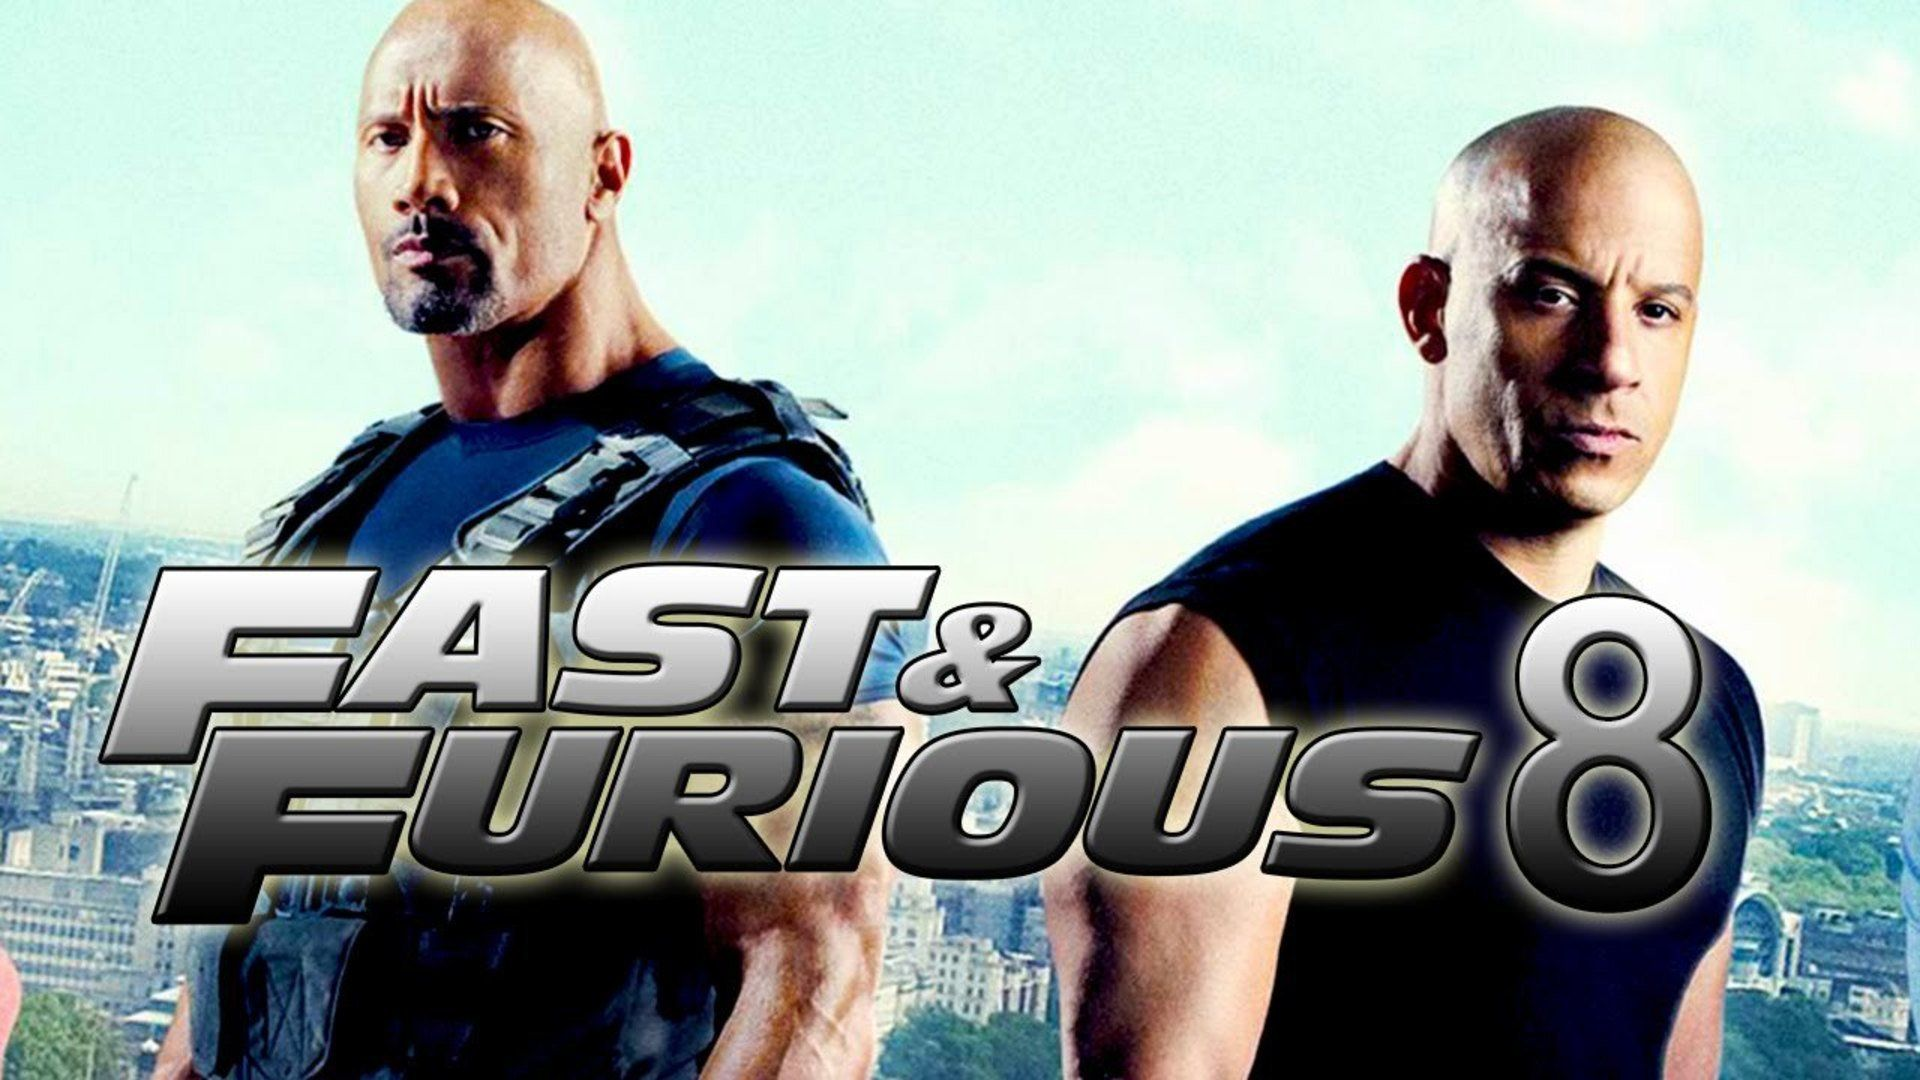 watch the fate of the furious hd movie tv shows putlocker